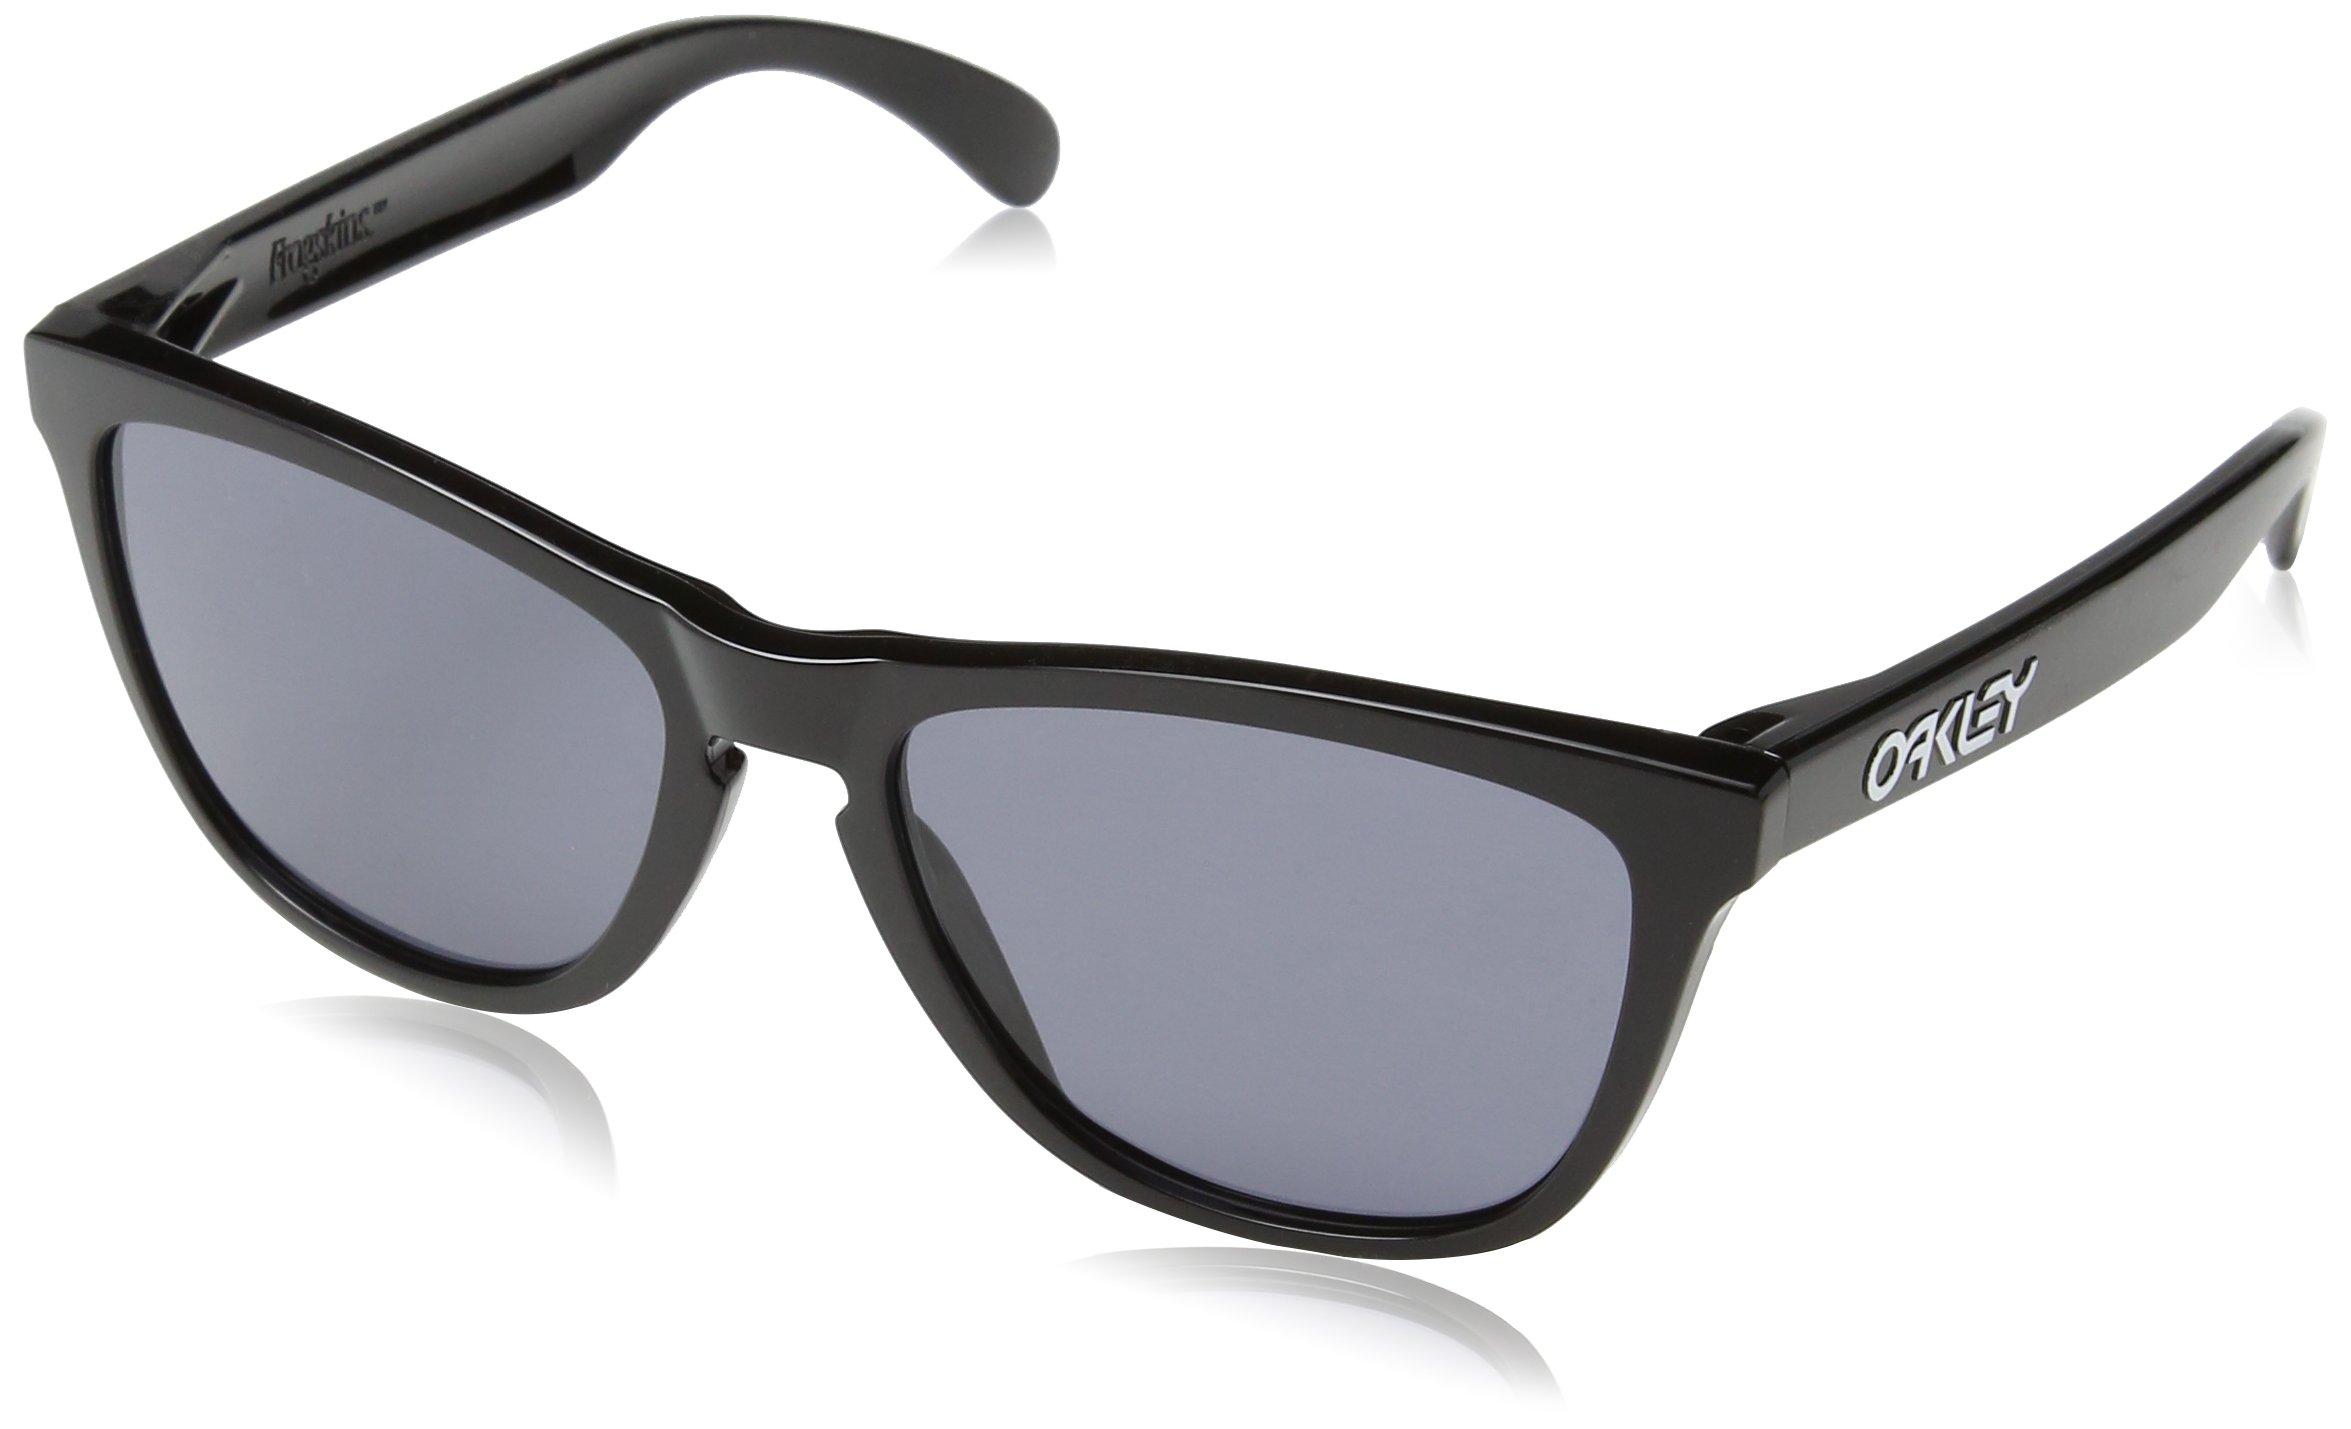 Oakley Men's Frogskins (a) Polarized Iridium Rectangular Sunglasses, Matte Brown Tortoise, 54 mm